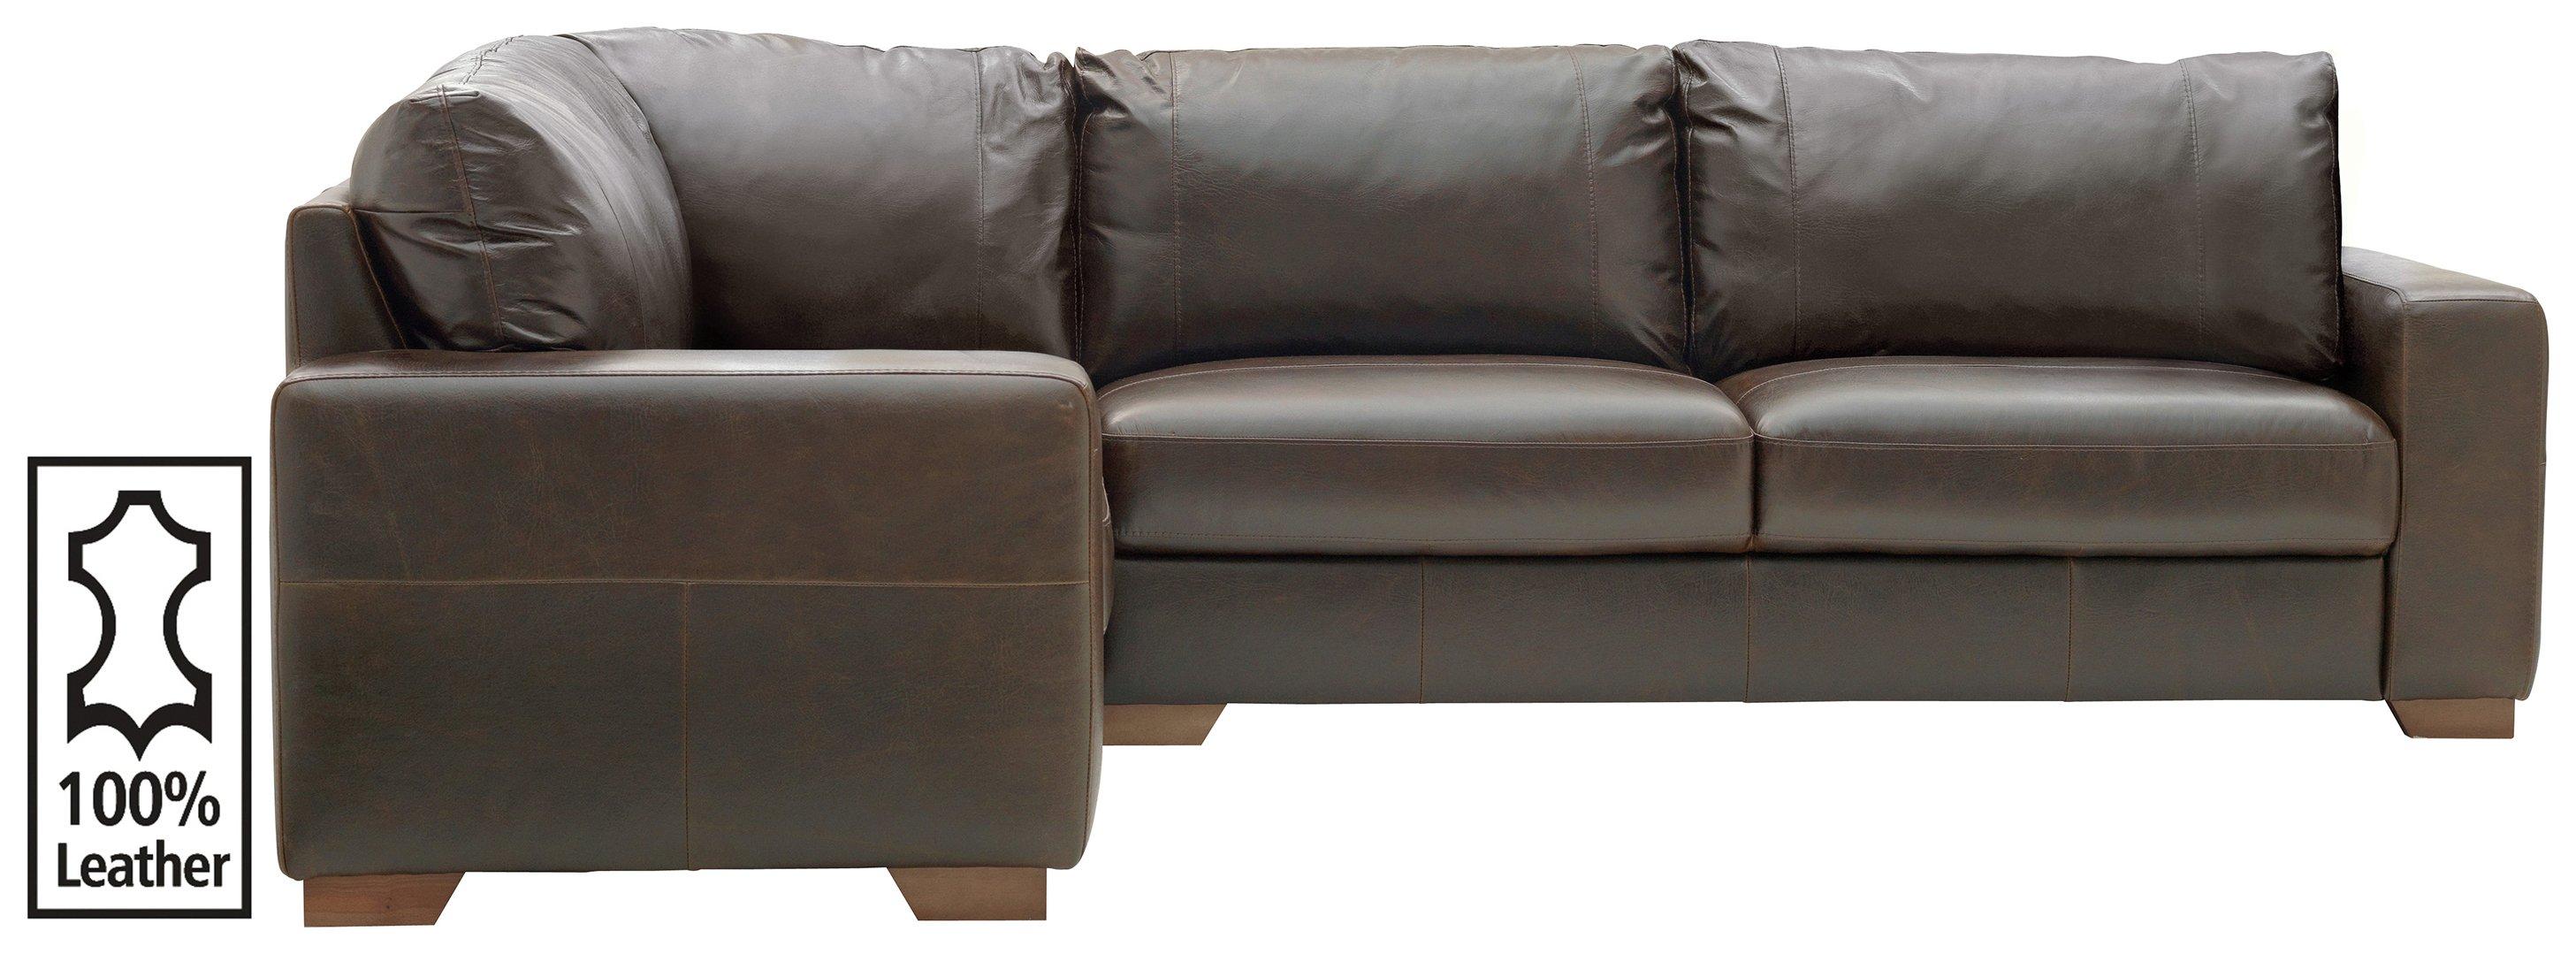 Argos Home Eton Left Corner Leather Sofa - Dark Brown